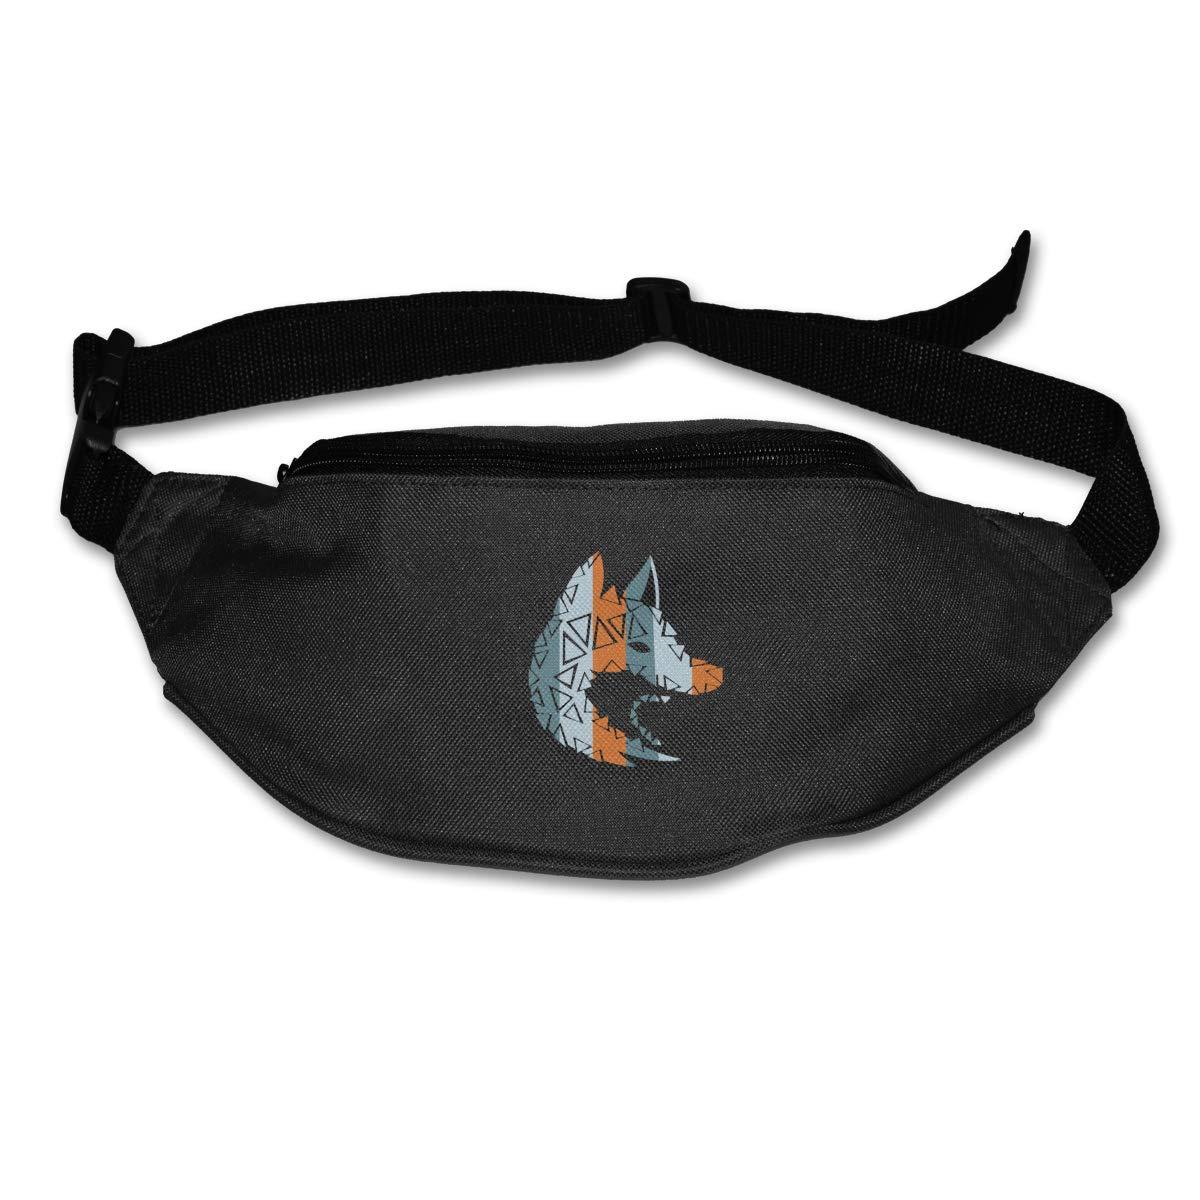 Fox Head Sport Waist Packs Fanny Pack Adjustable For Hike